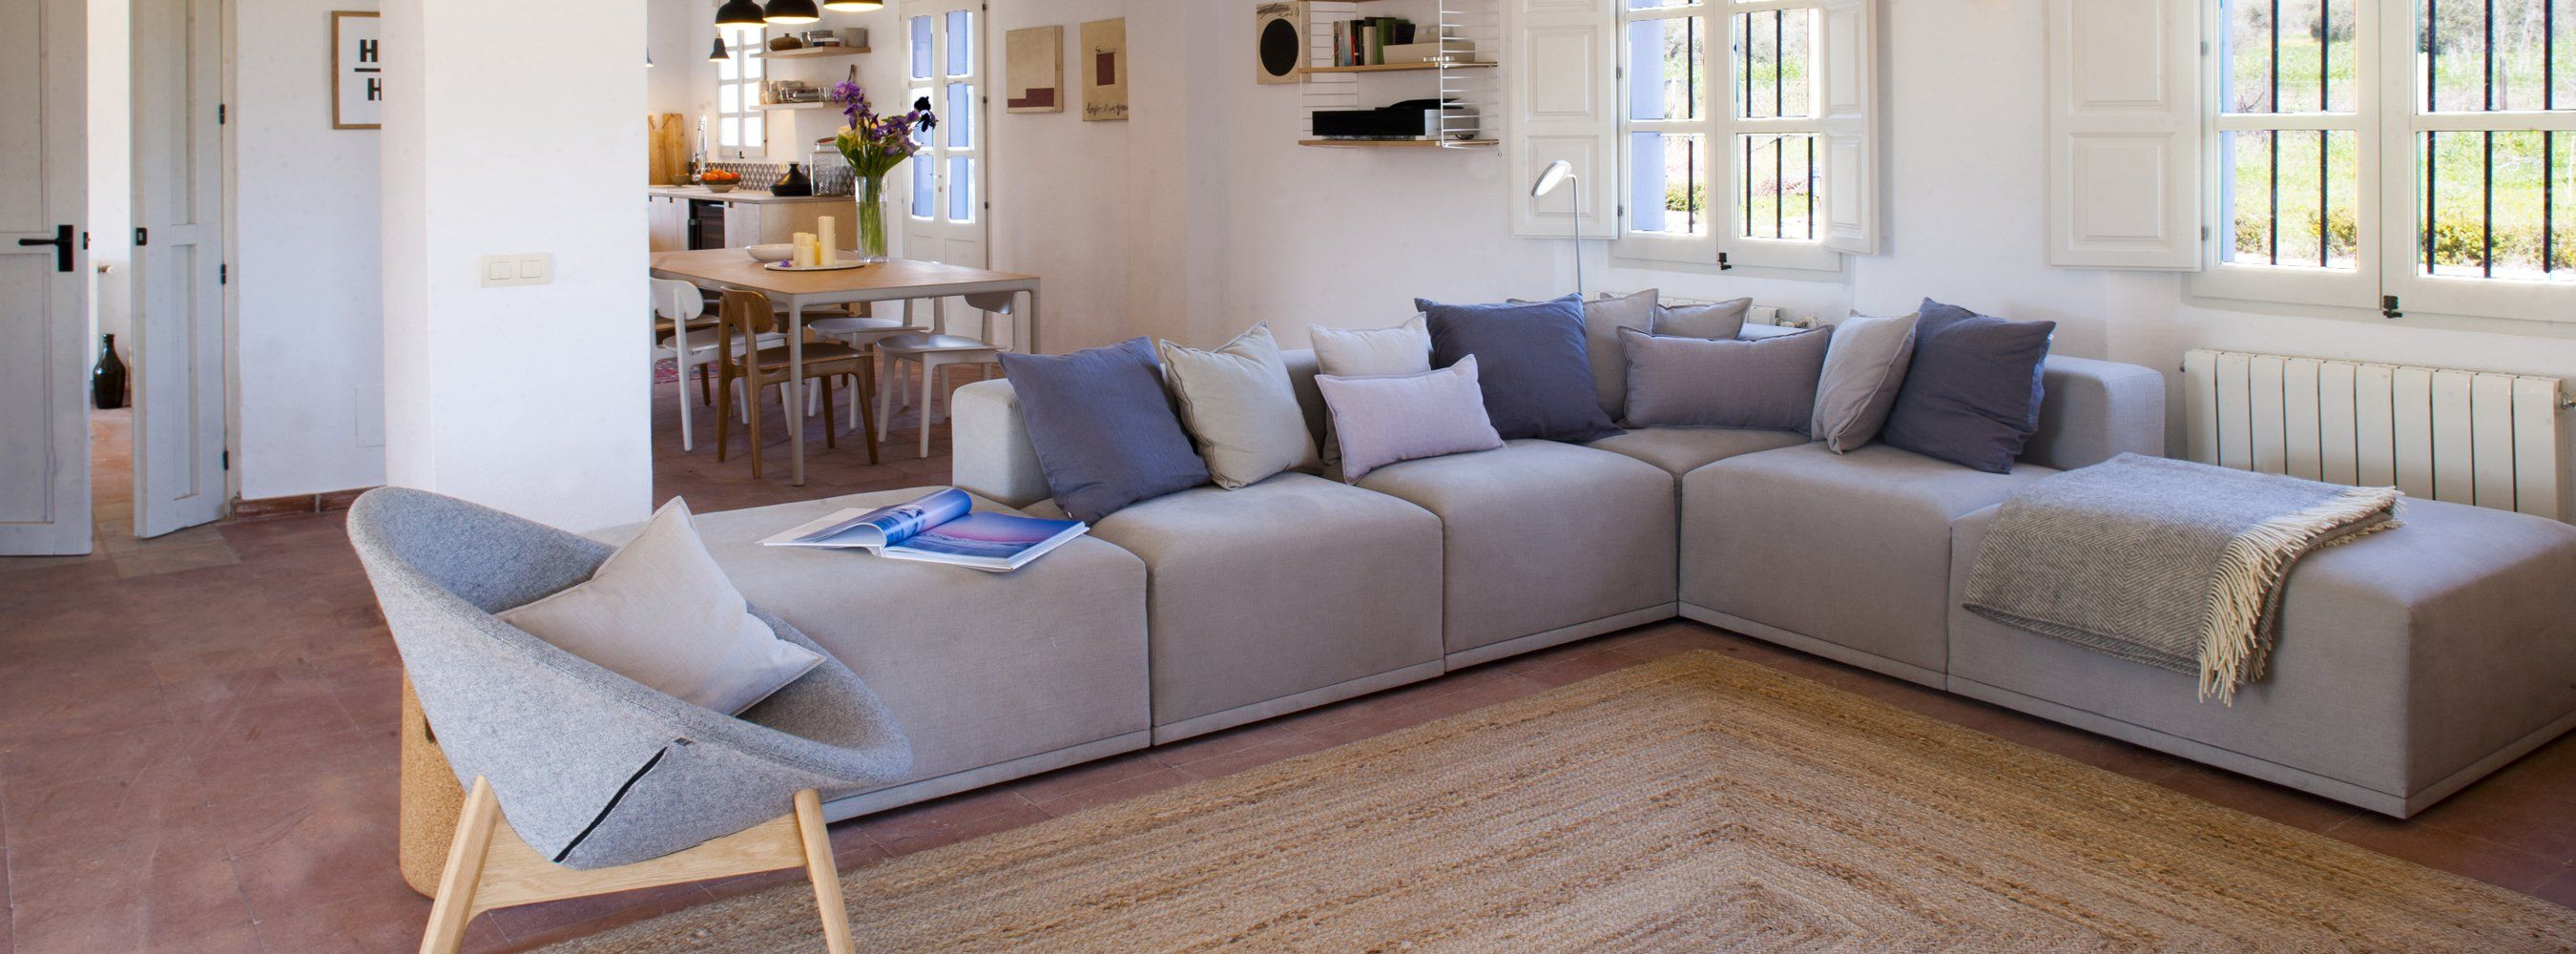 sitting room ronda villa